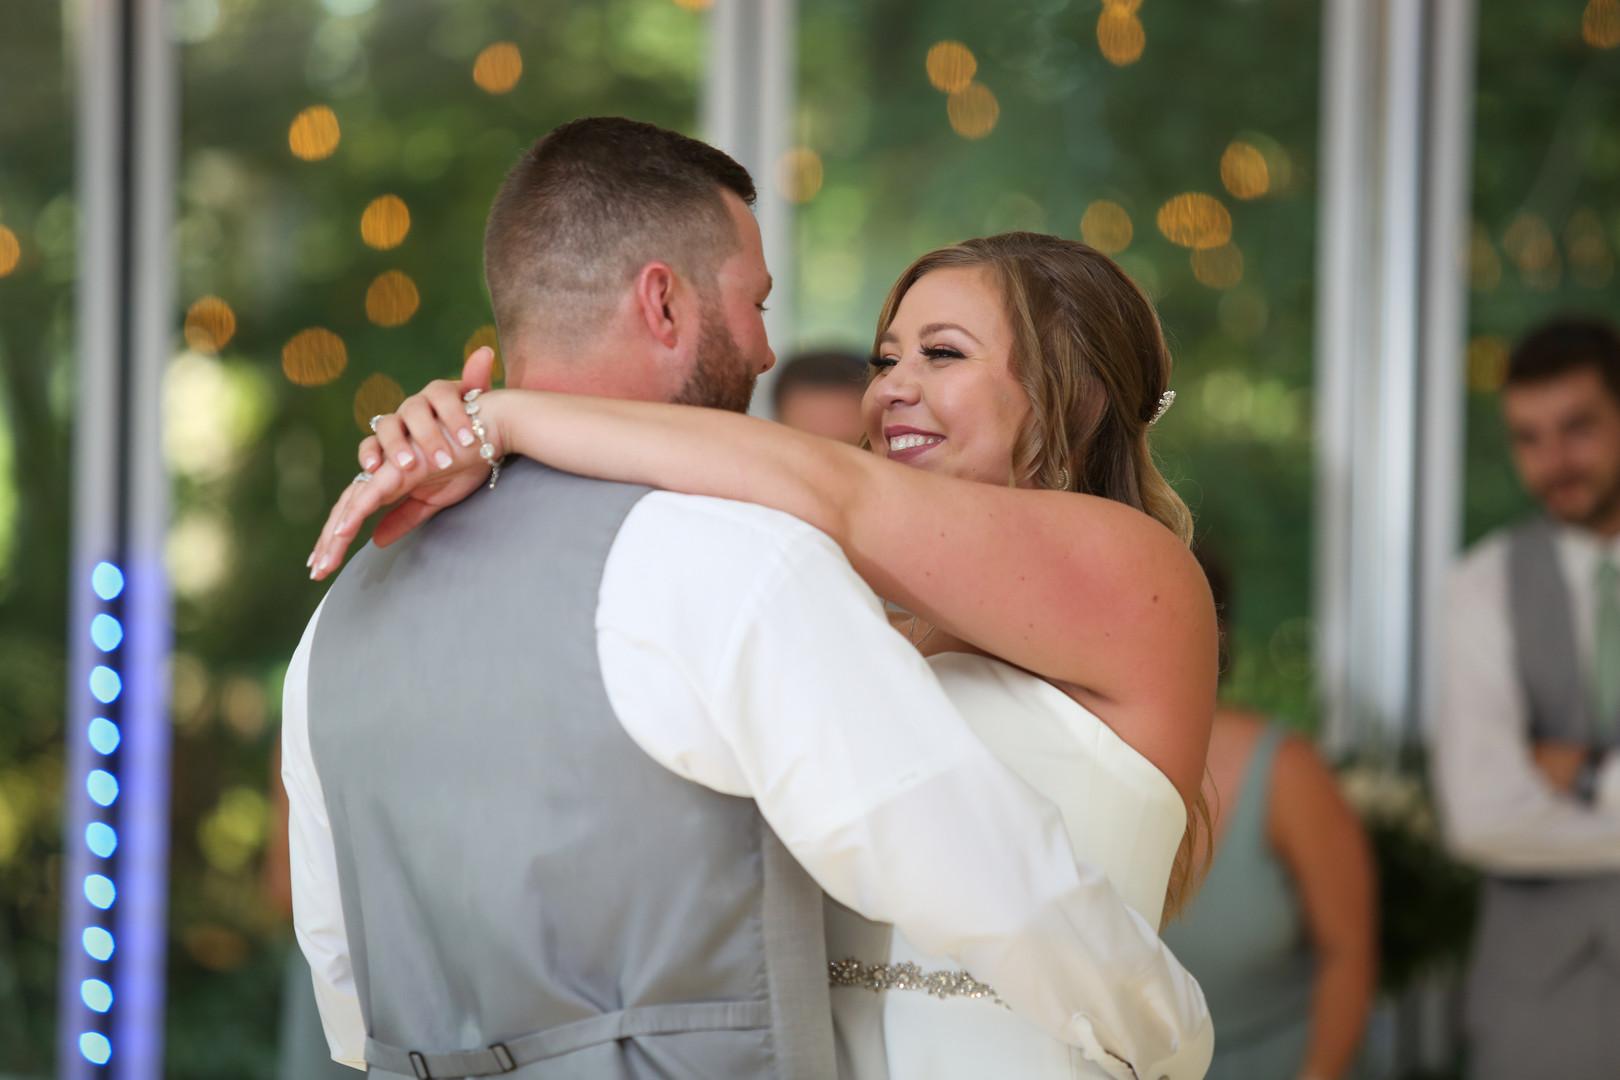 Wedding photographer Denton.jpg